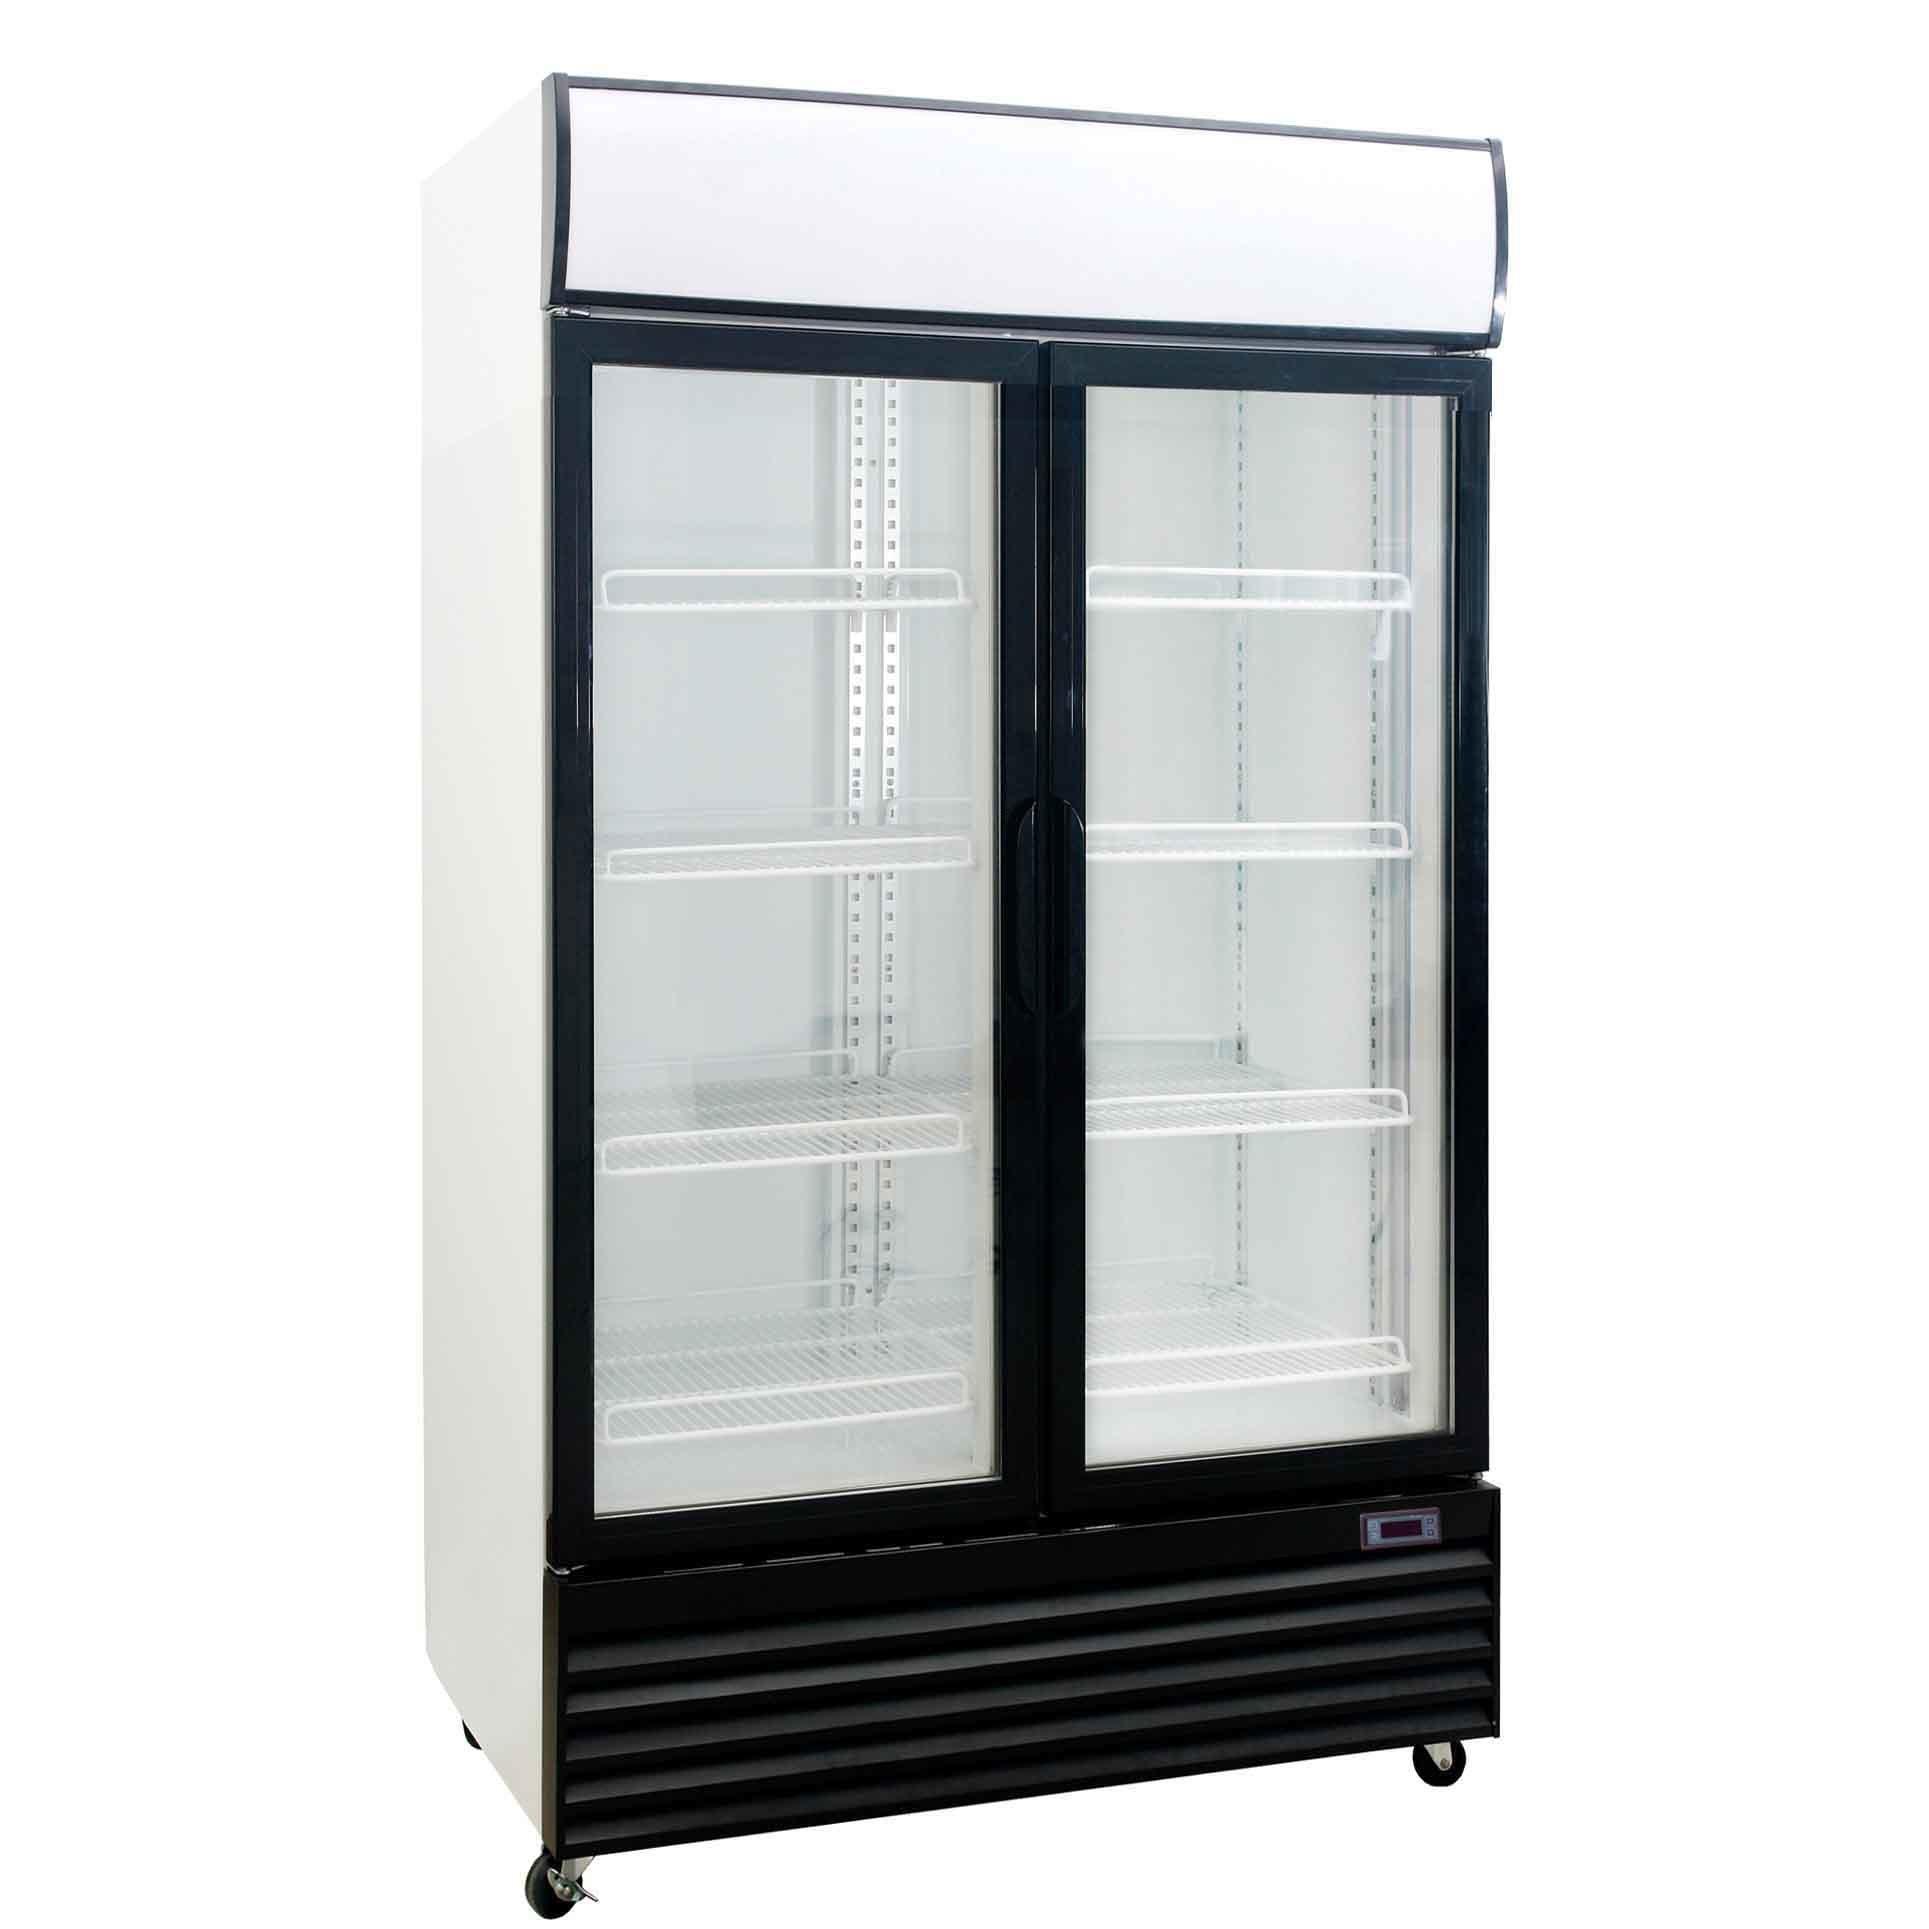 China 1000L Upright Commercial Refrigerator SSP1000WBA